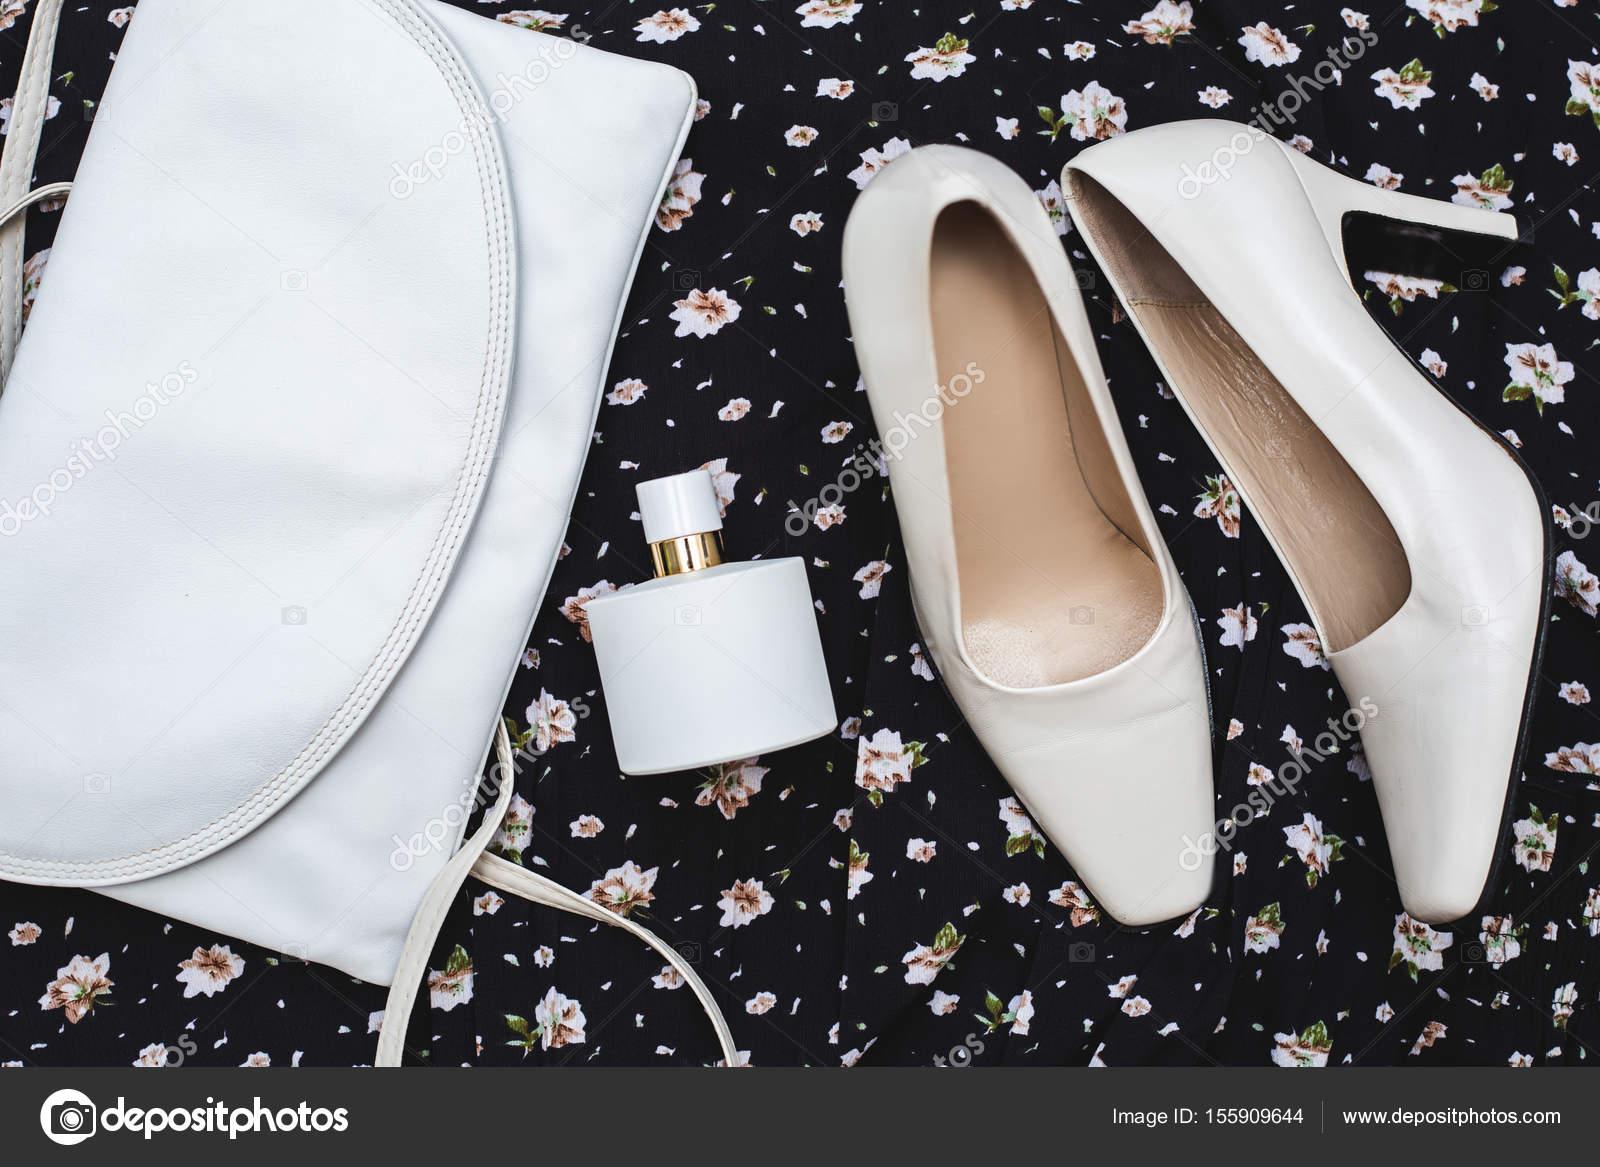 f8ee131b294 Κομψά γυναικεία αξεσουάρ. Παπούτσια λευκά με τσάντα και άρωμα– εικόνα  αρχείου